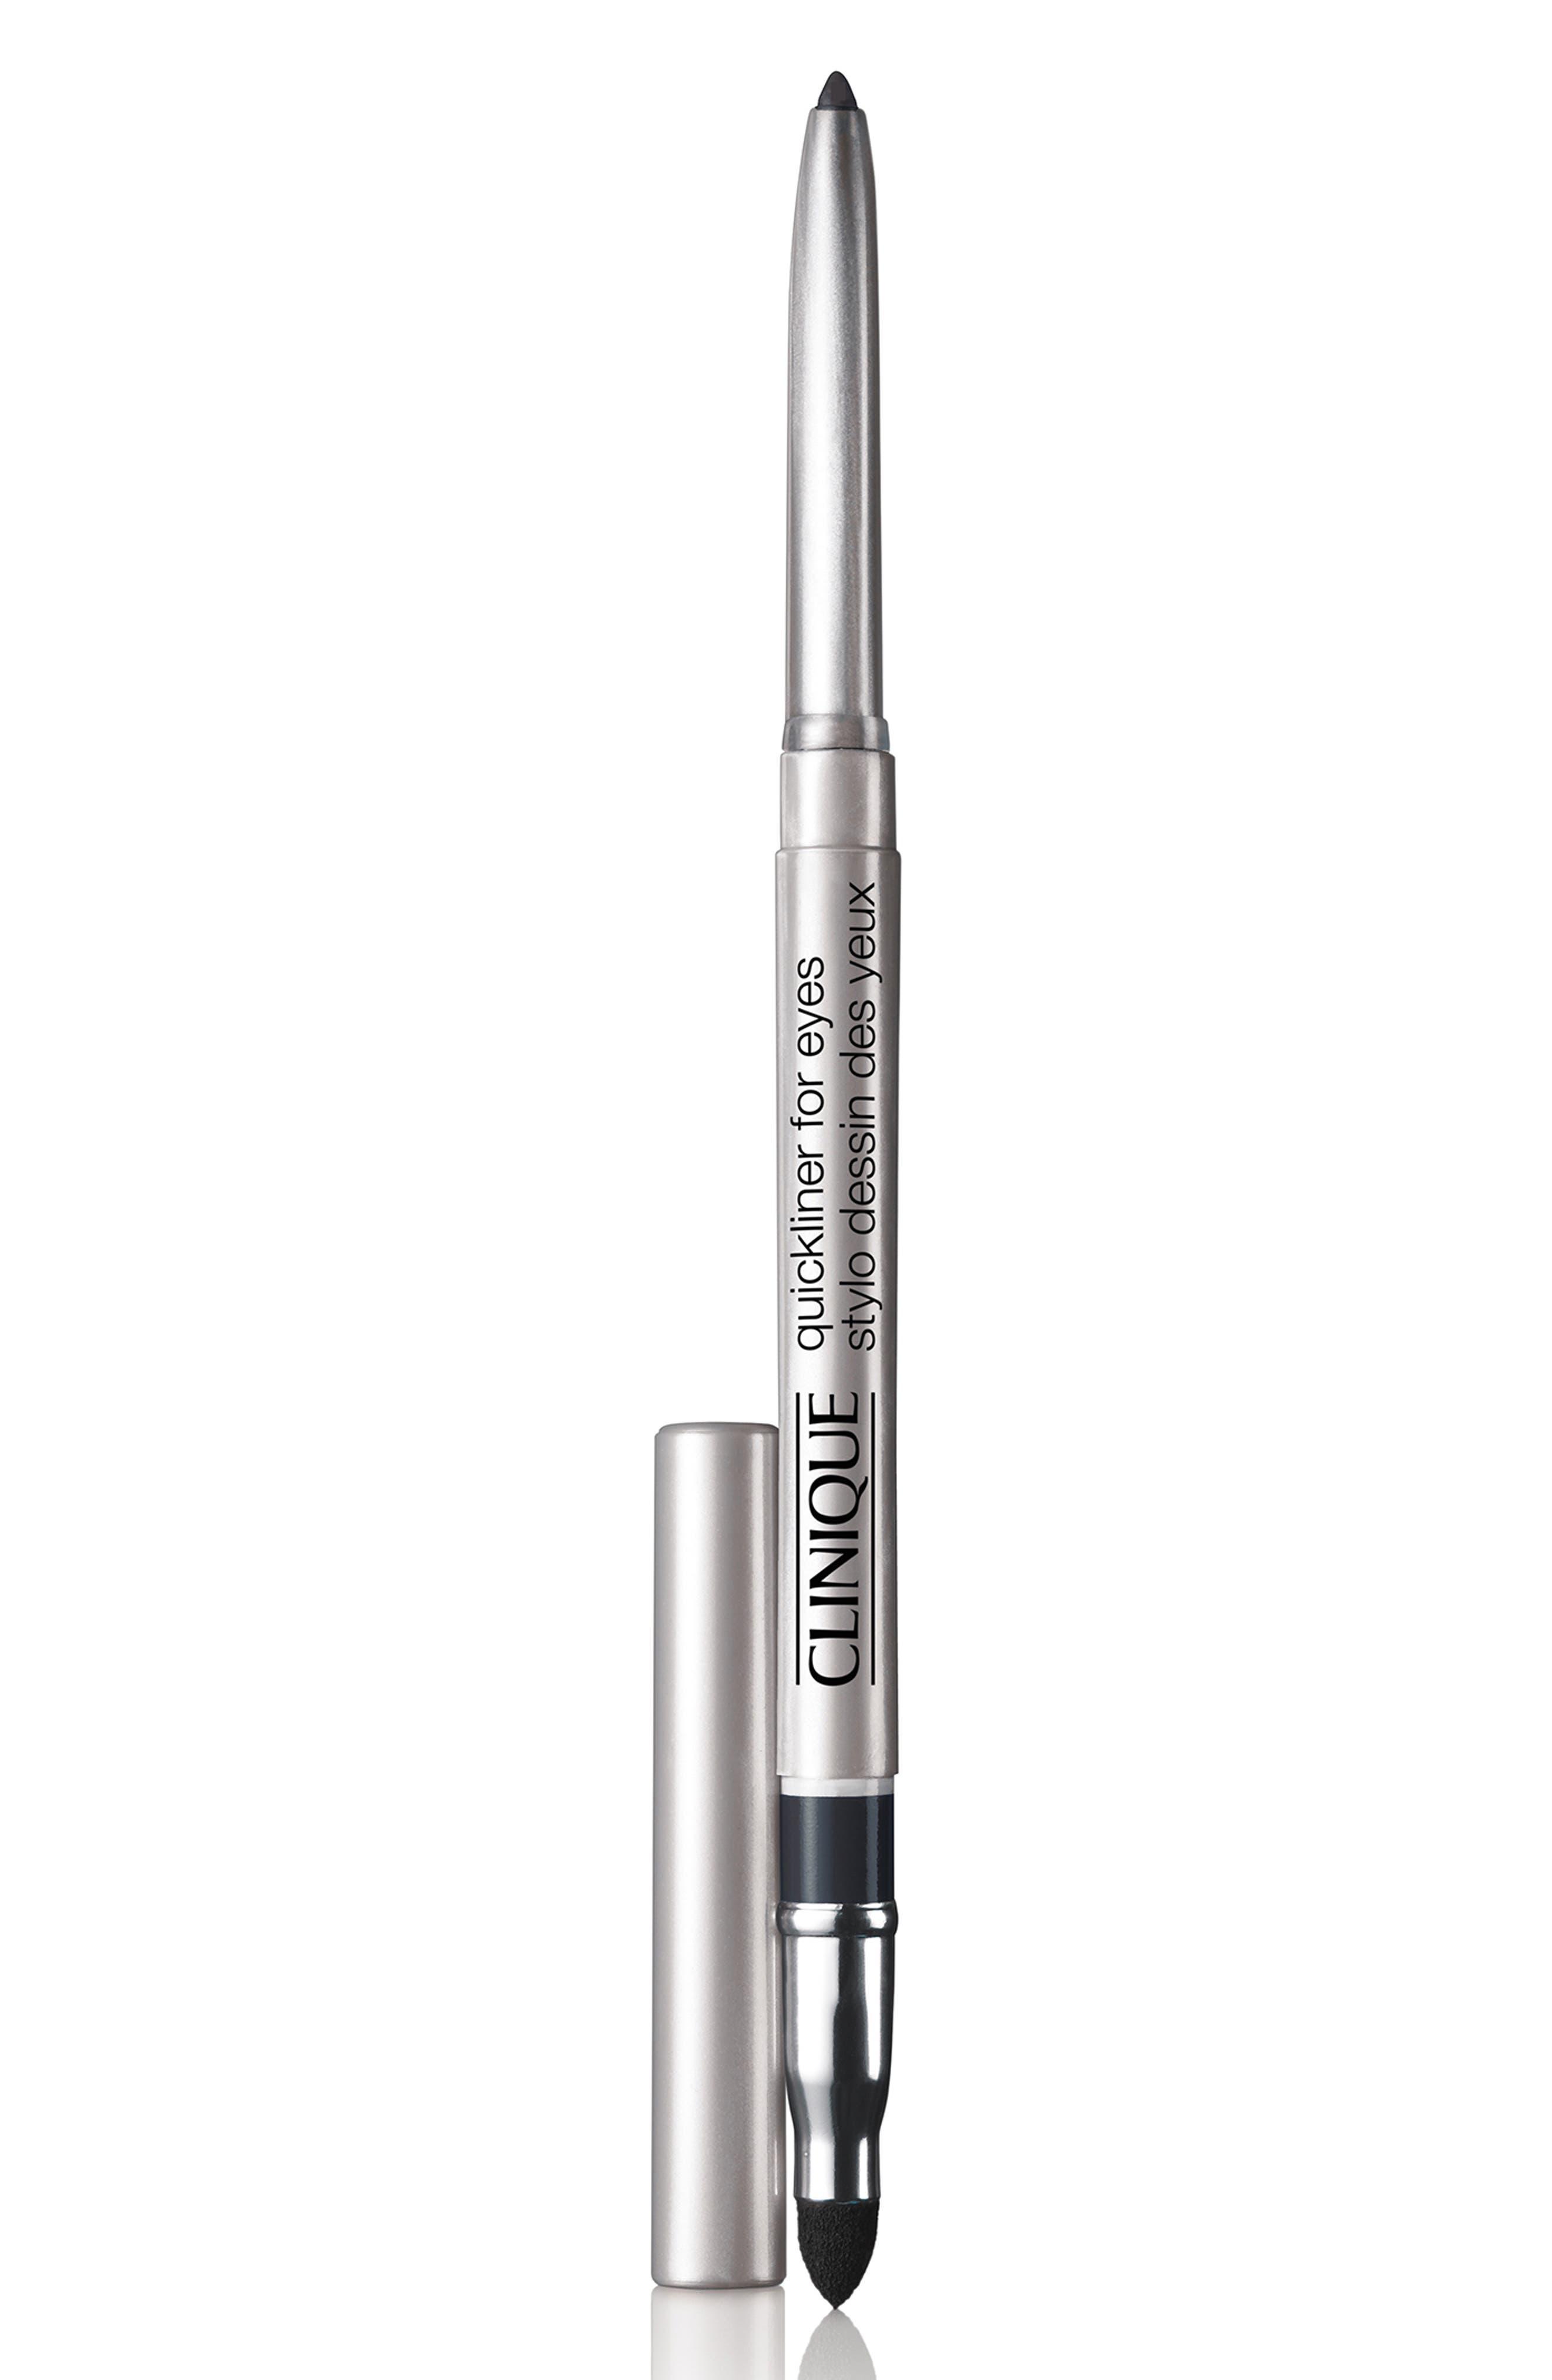 Clinique Quickliner For Eyes Eyeliner Pencil - New Black